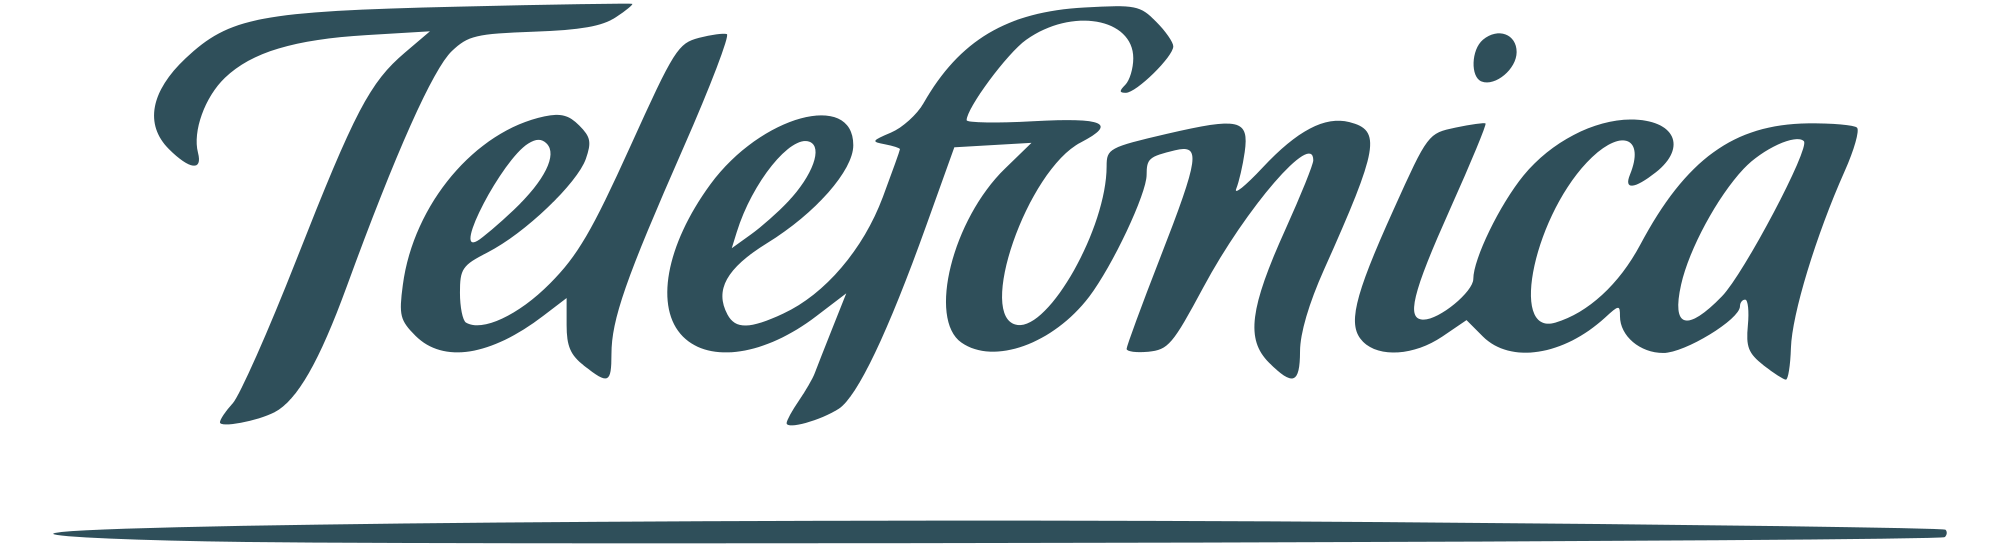 Telefónica. Global Incubator's clients.